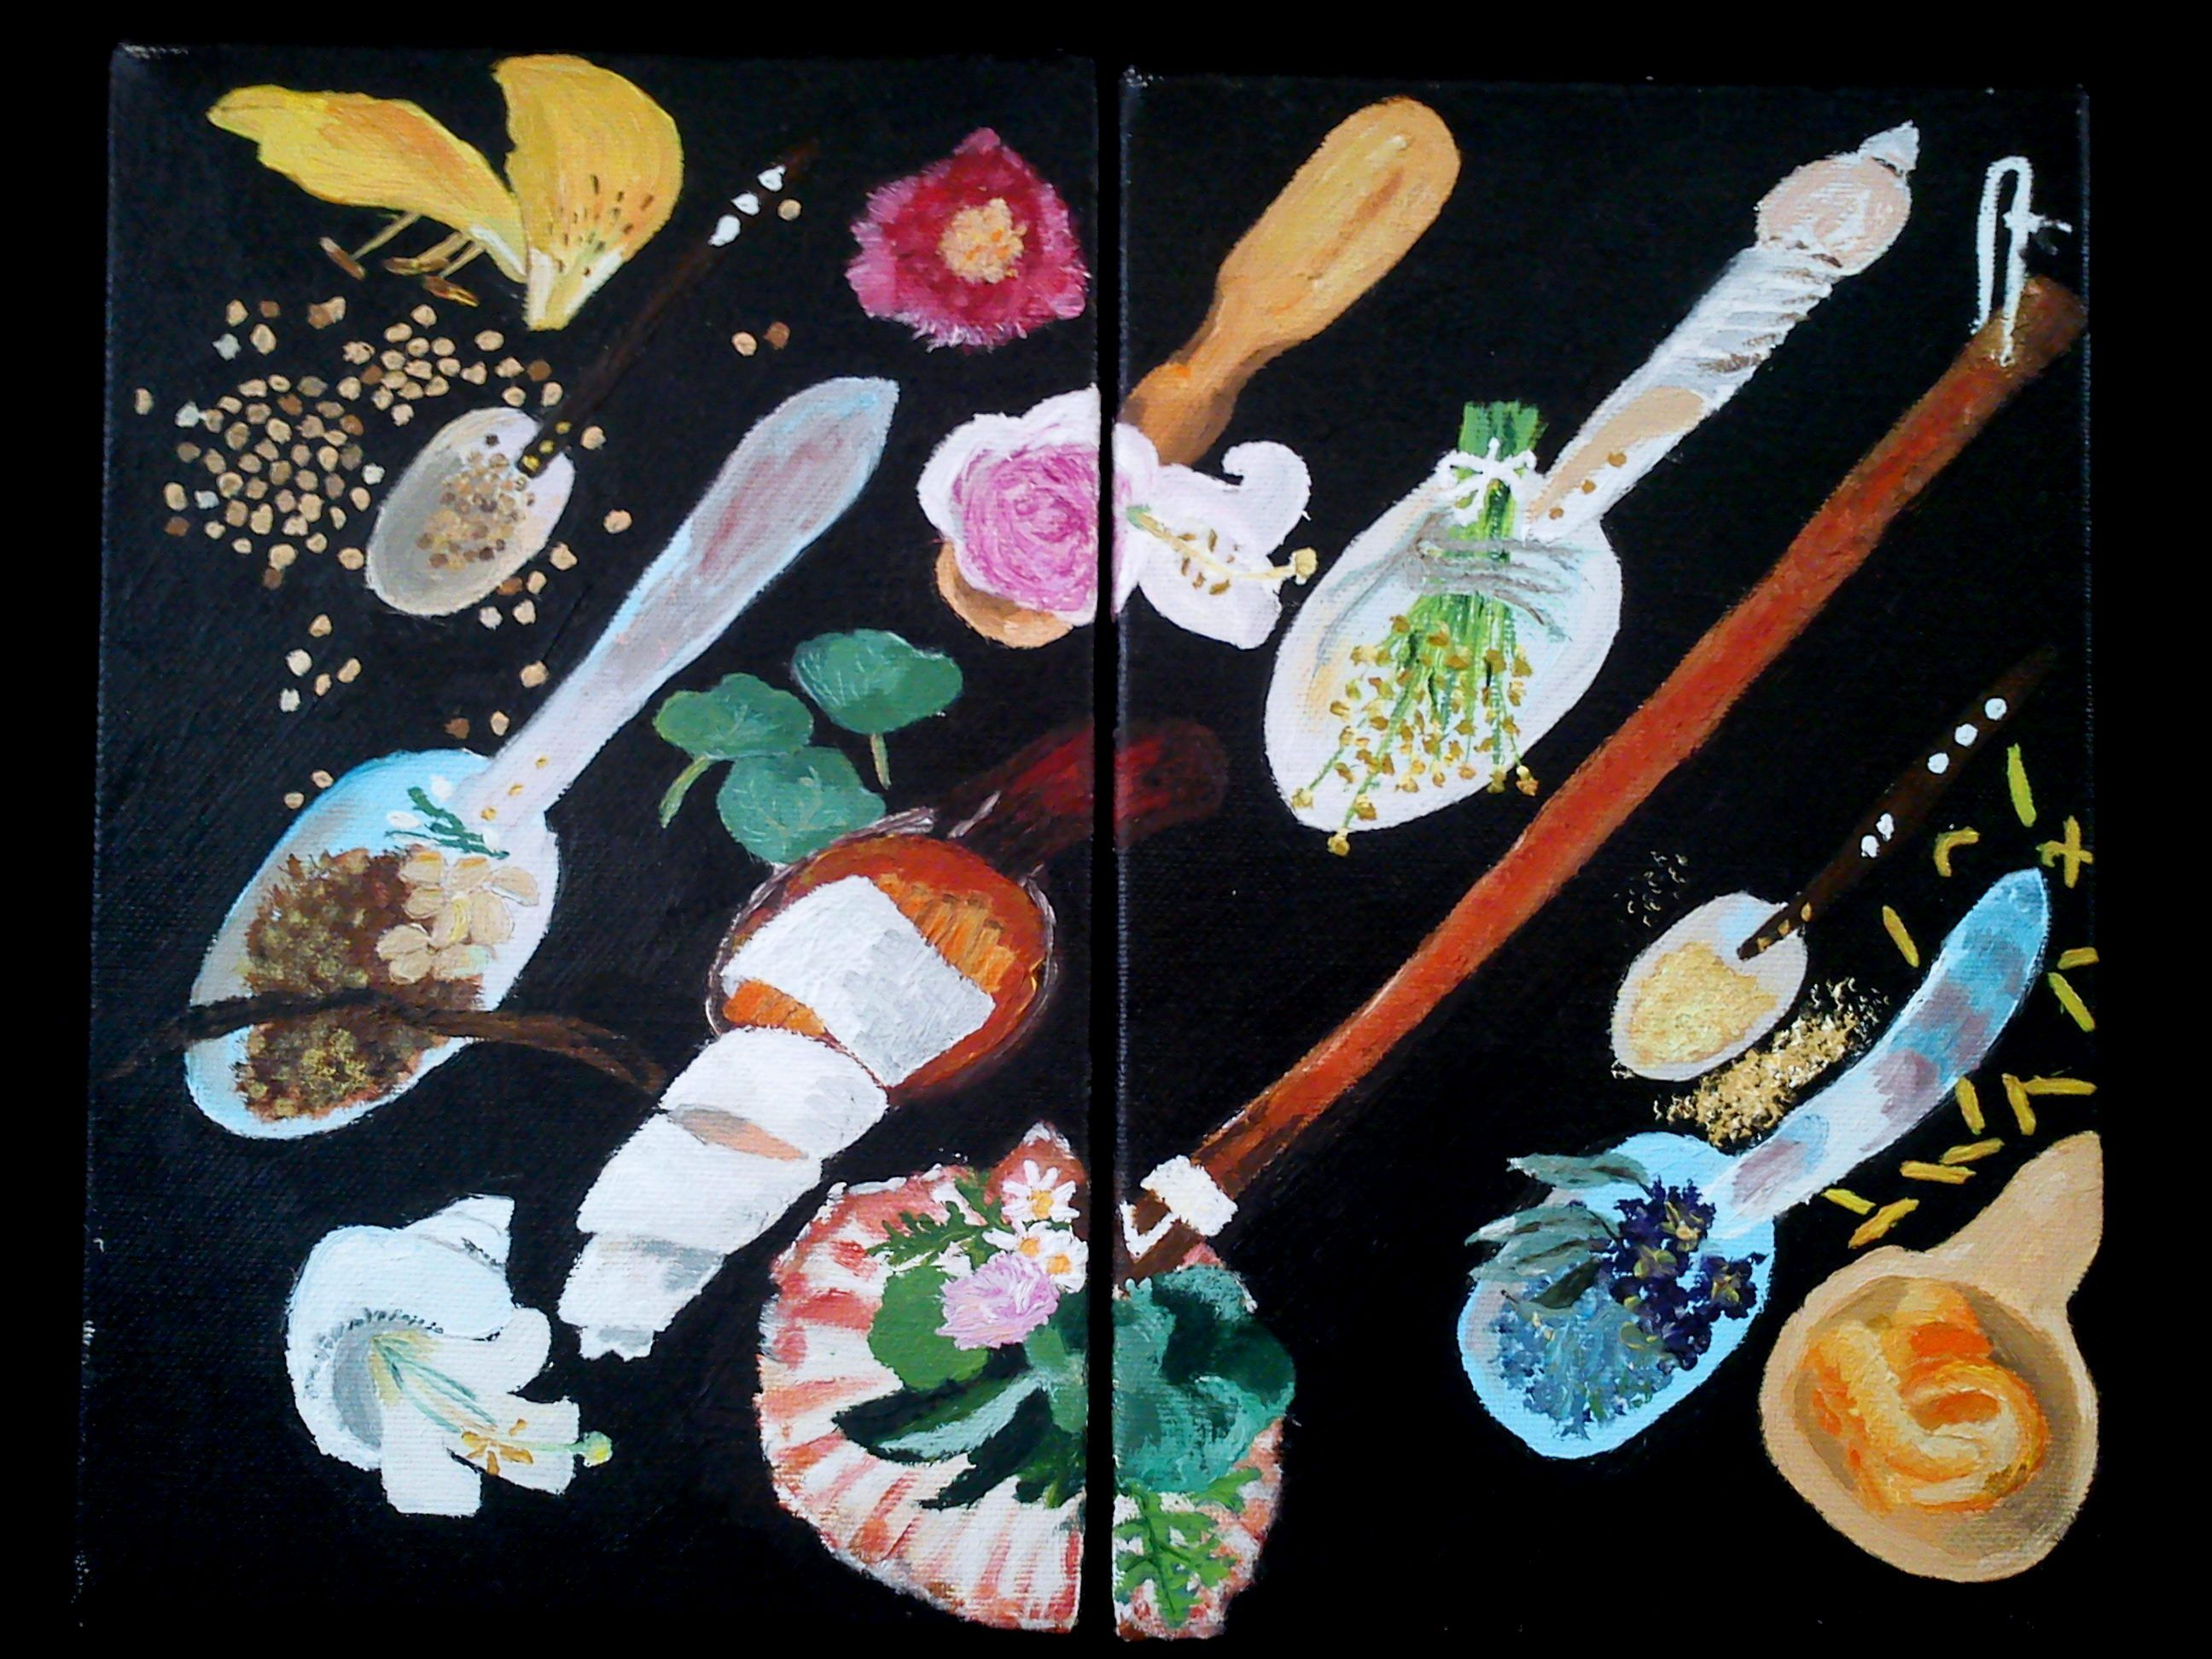 Especias/spice Pintura al oleo/ oil painting